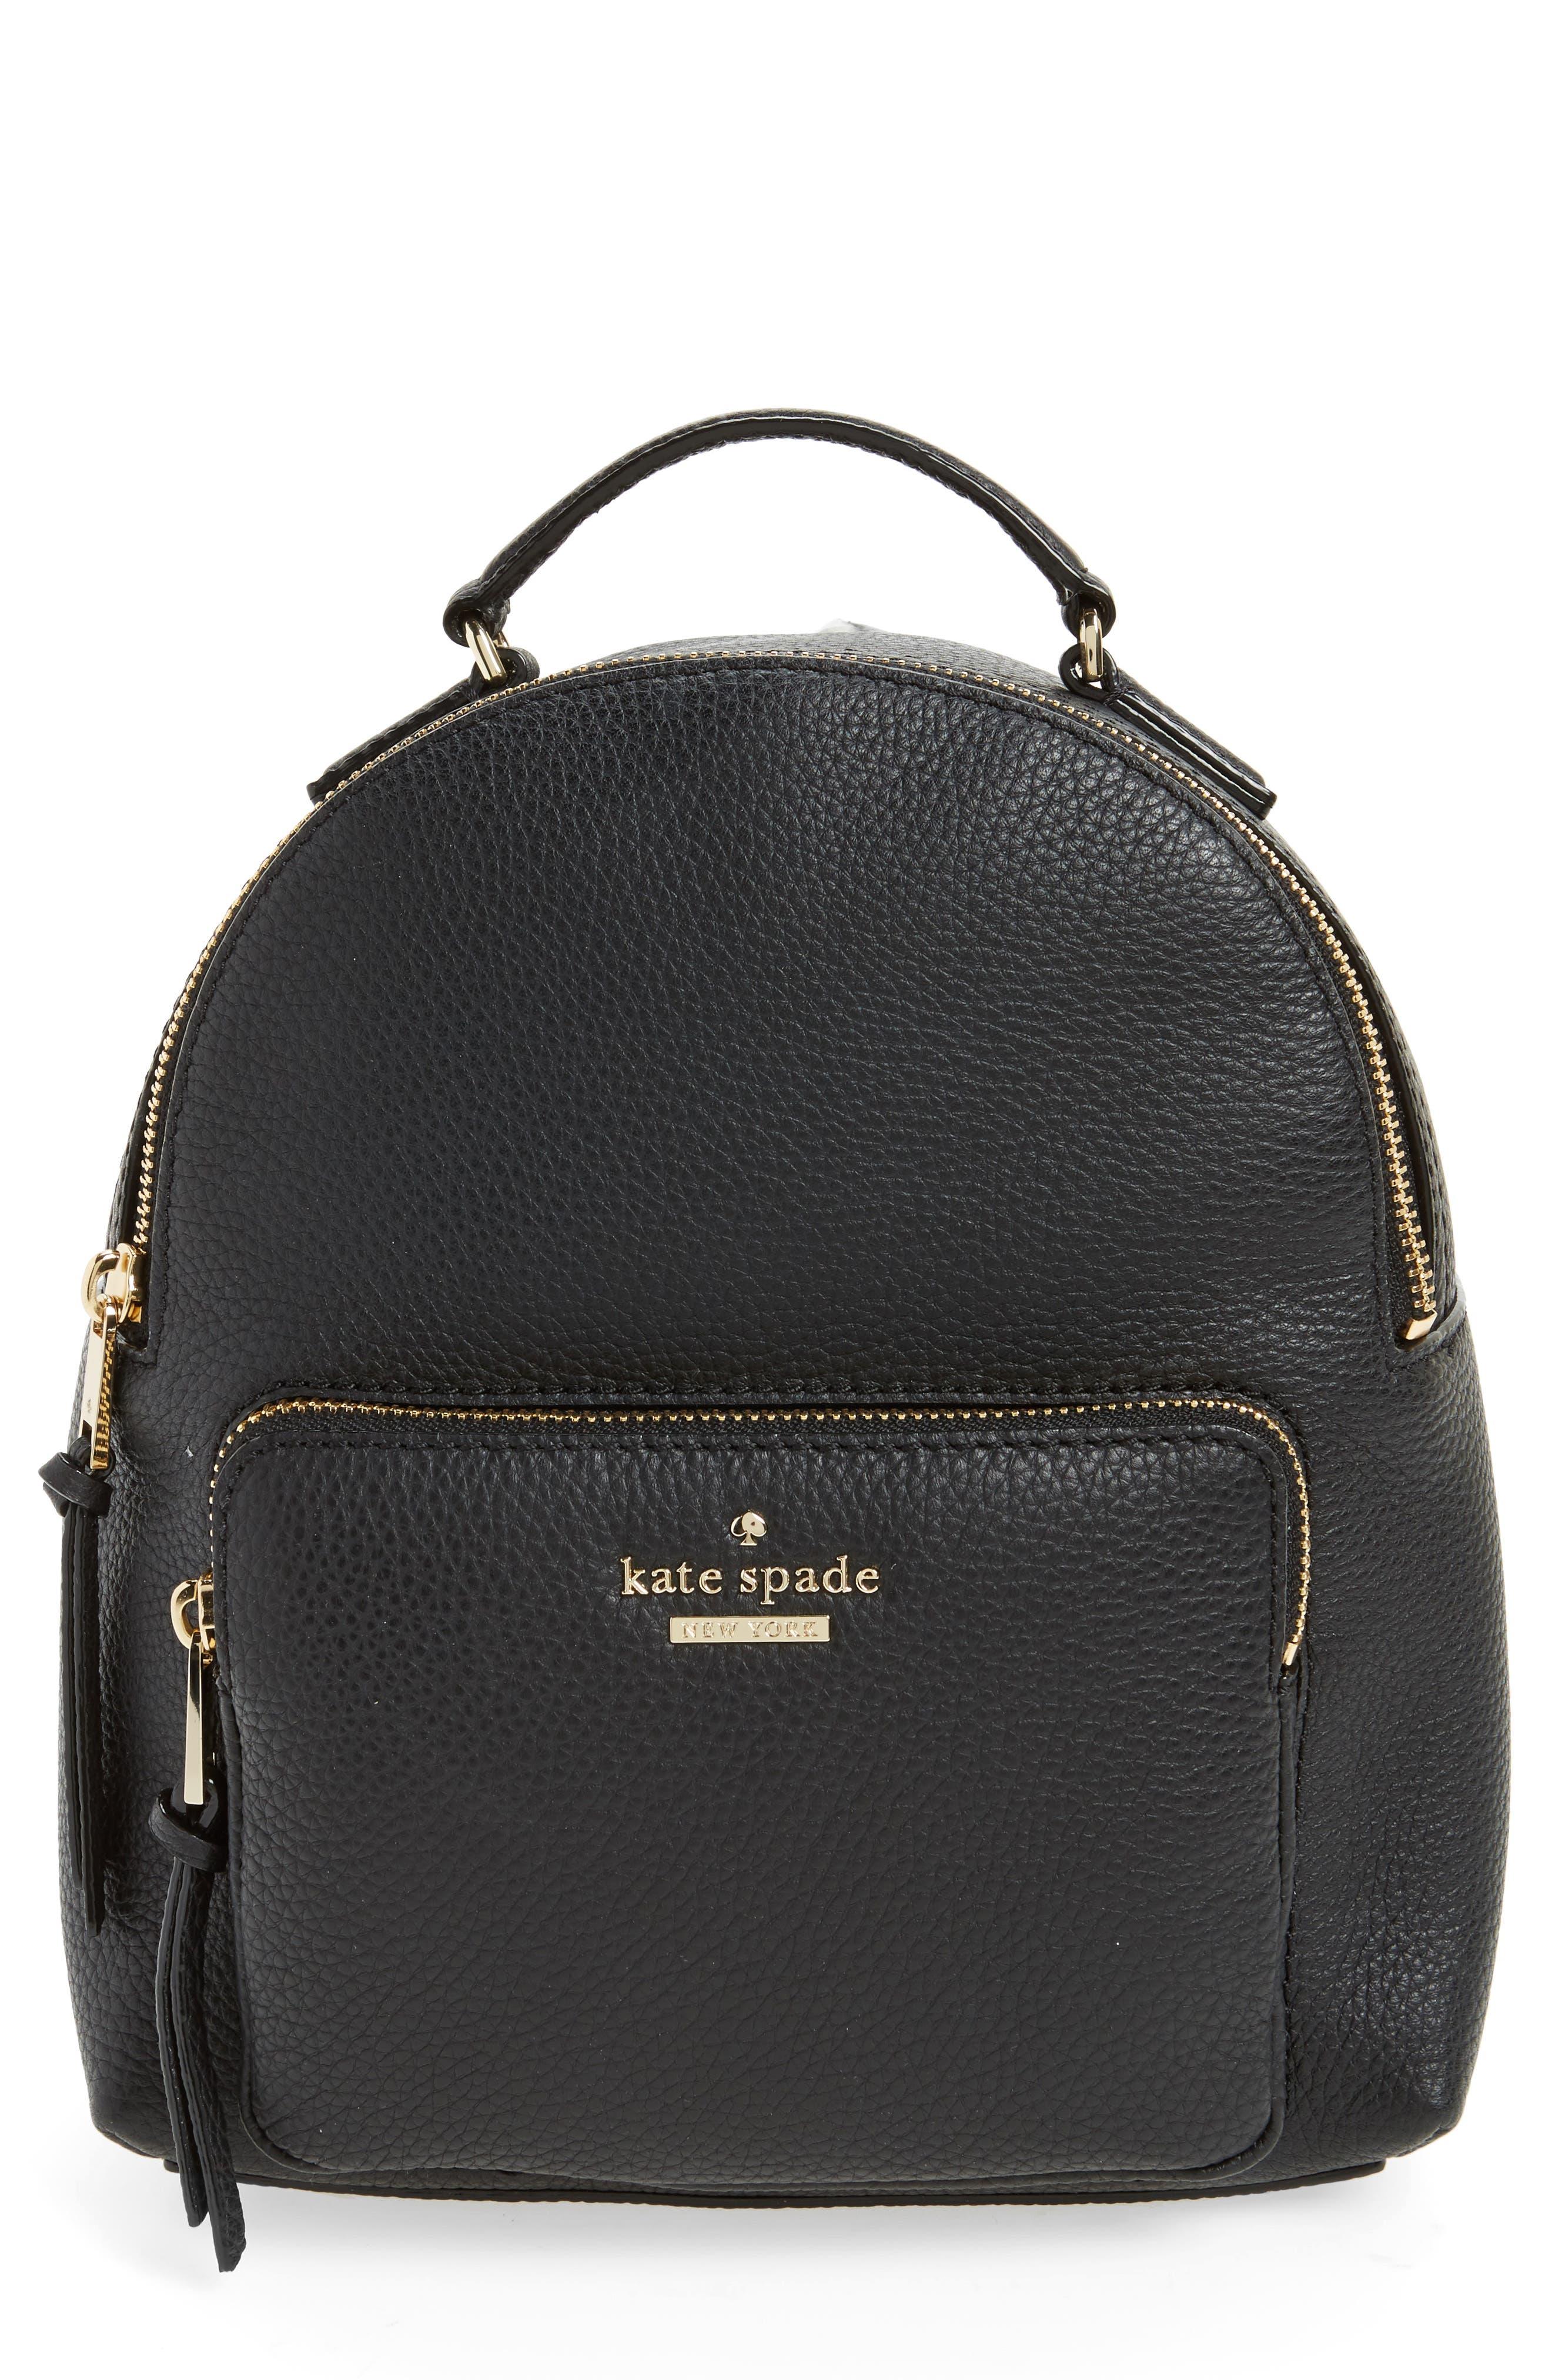 kate spade new york jackson street - keleigh leather backpack